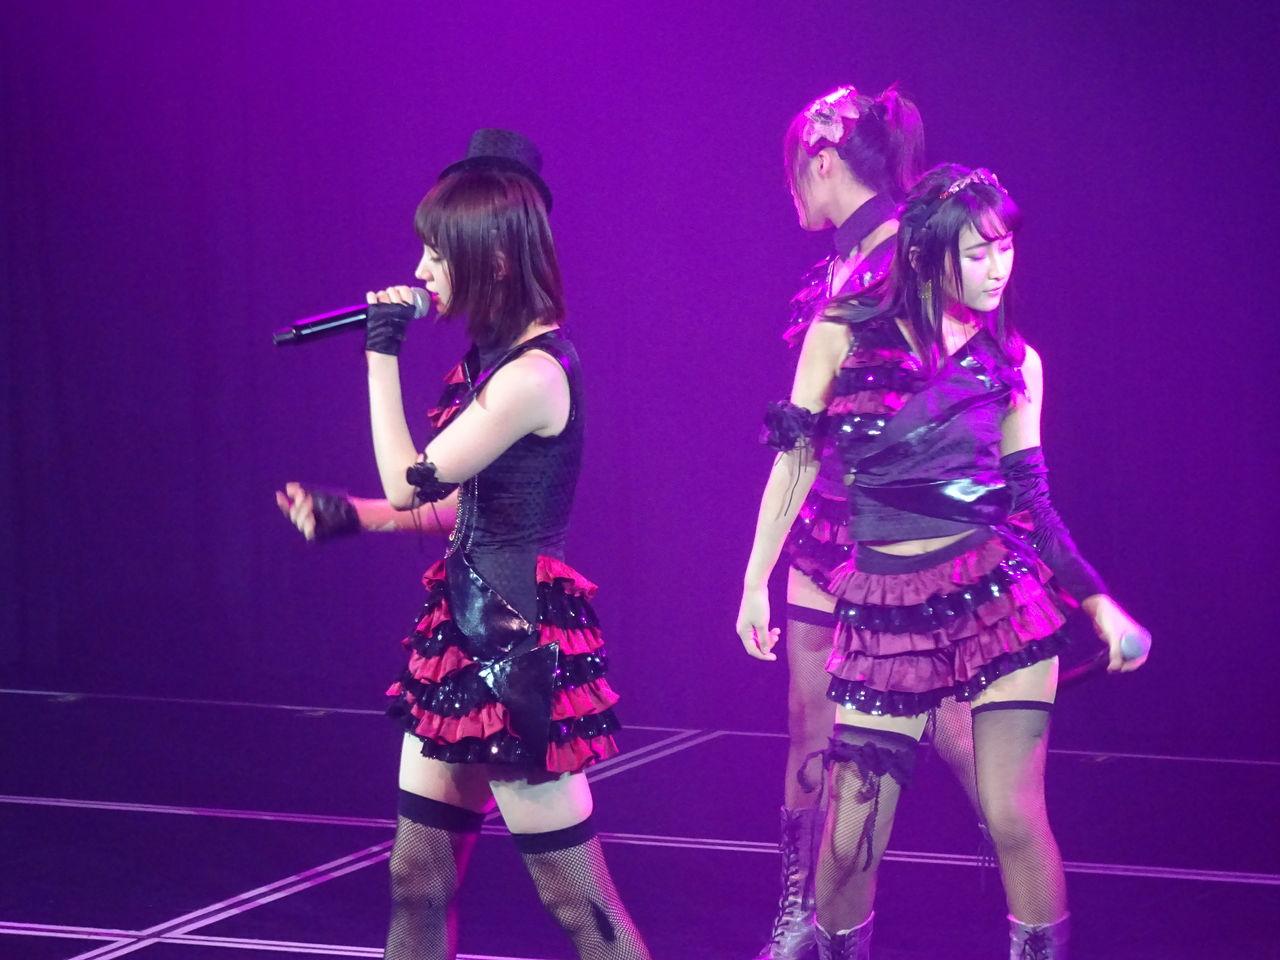 【NMB48】チームB2恋愛禁止条例公演初日の実況・感想まとめ